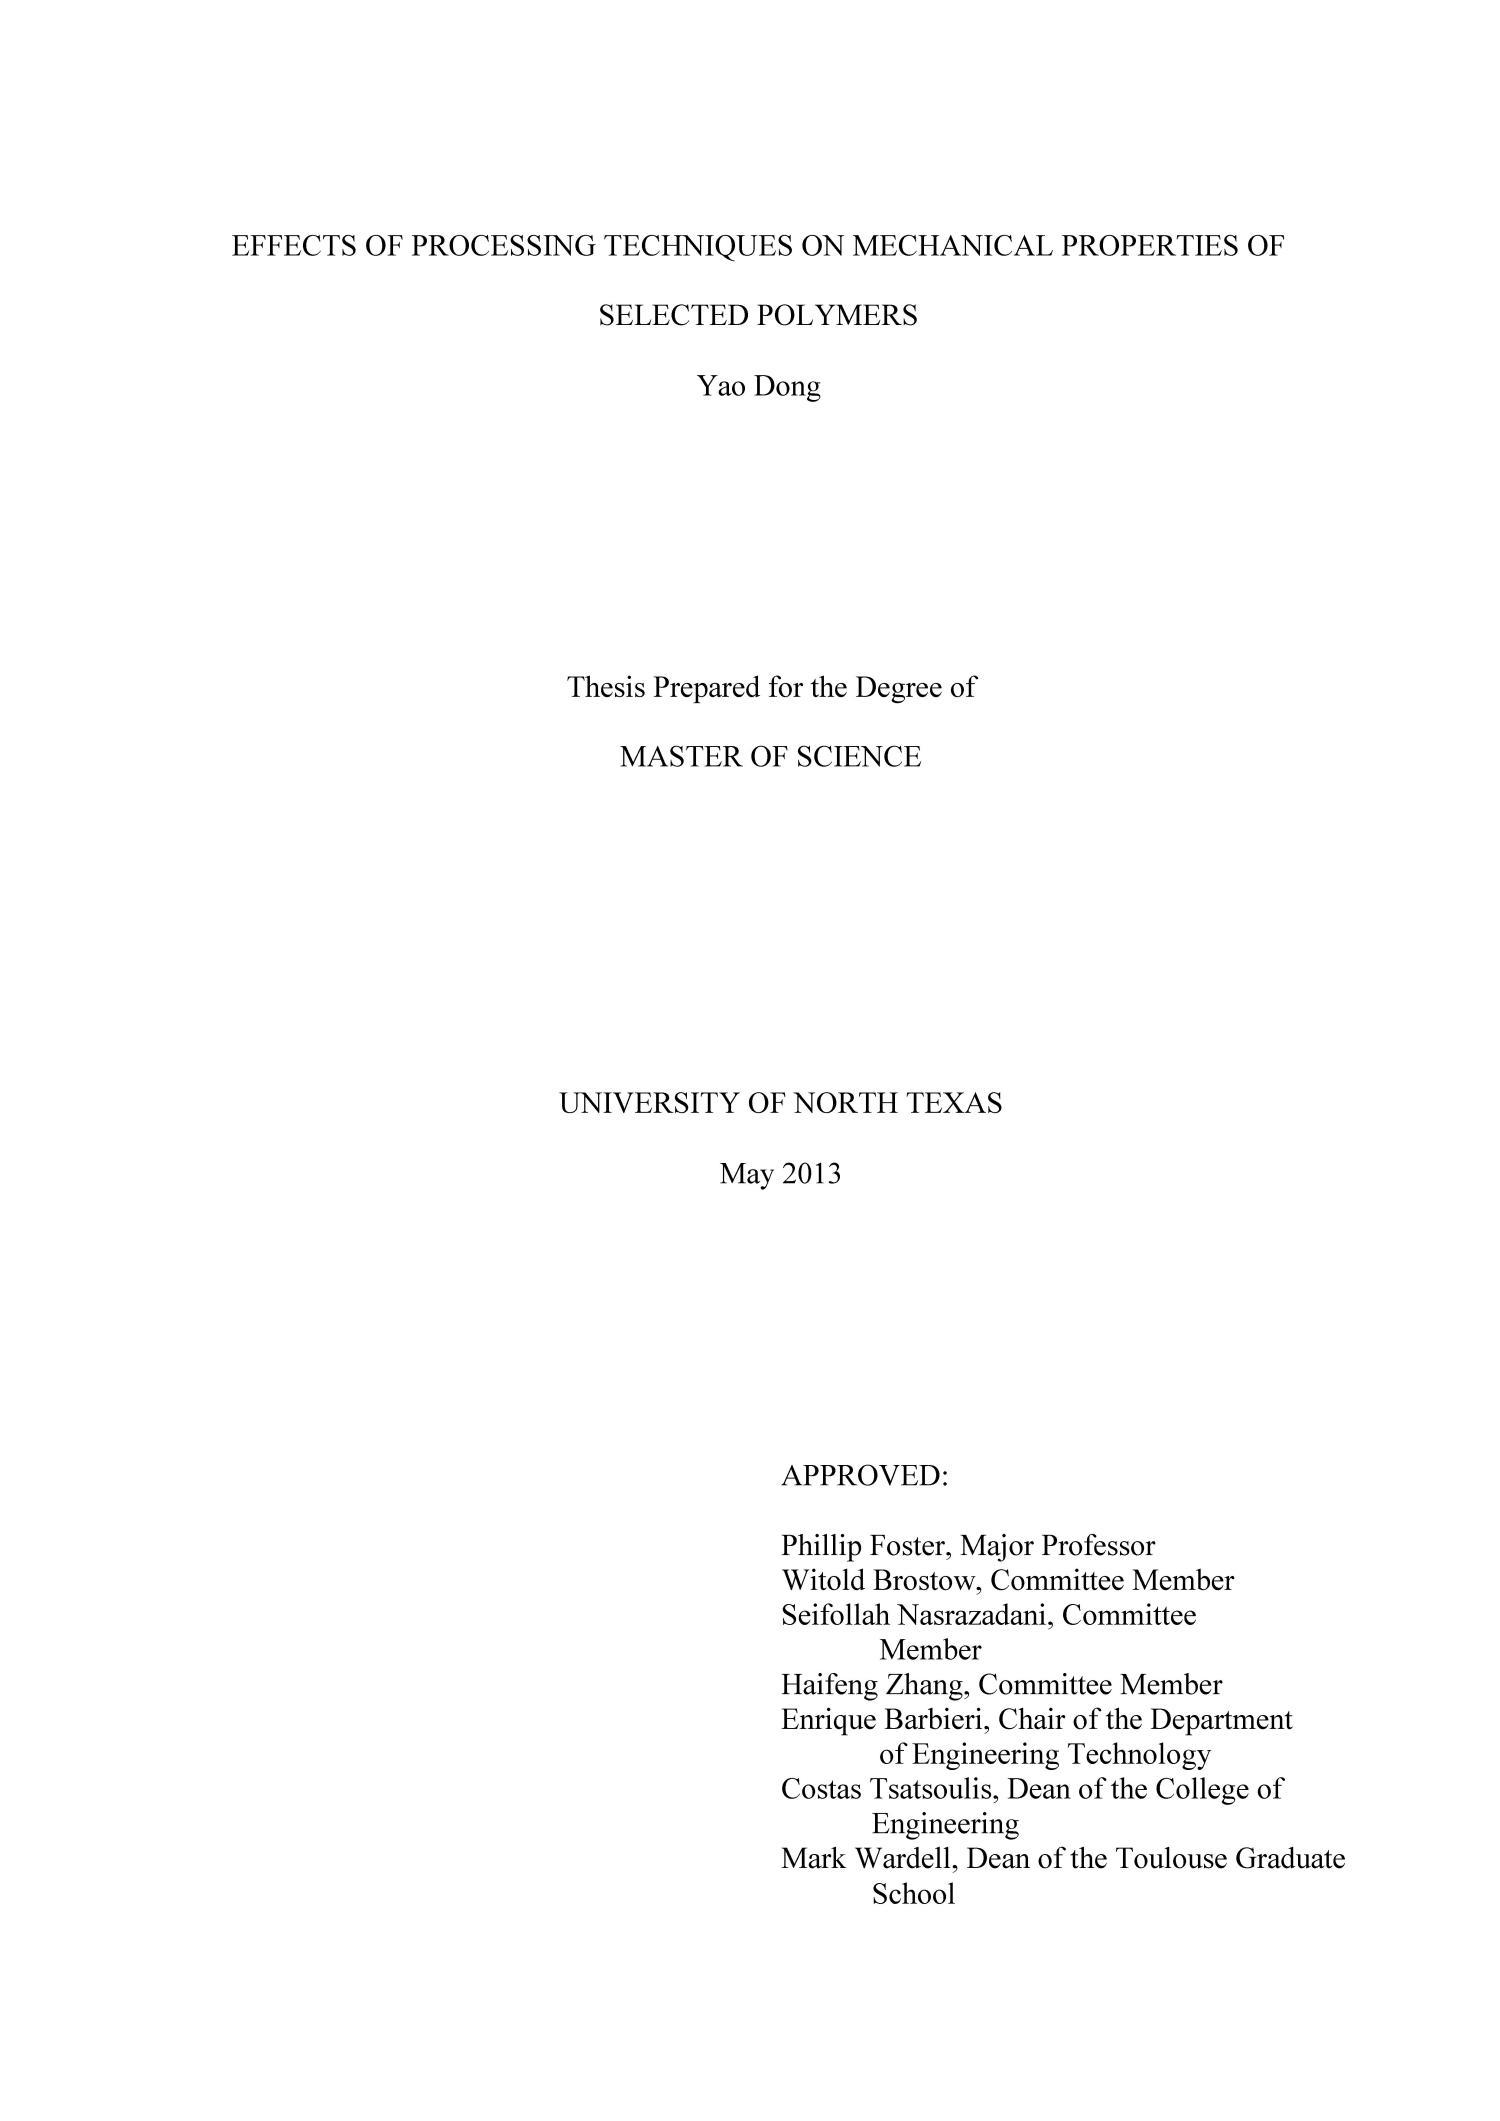 Dma thesis help